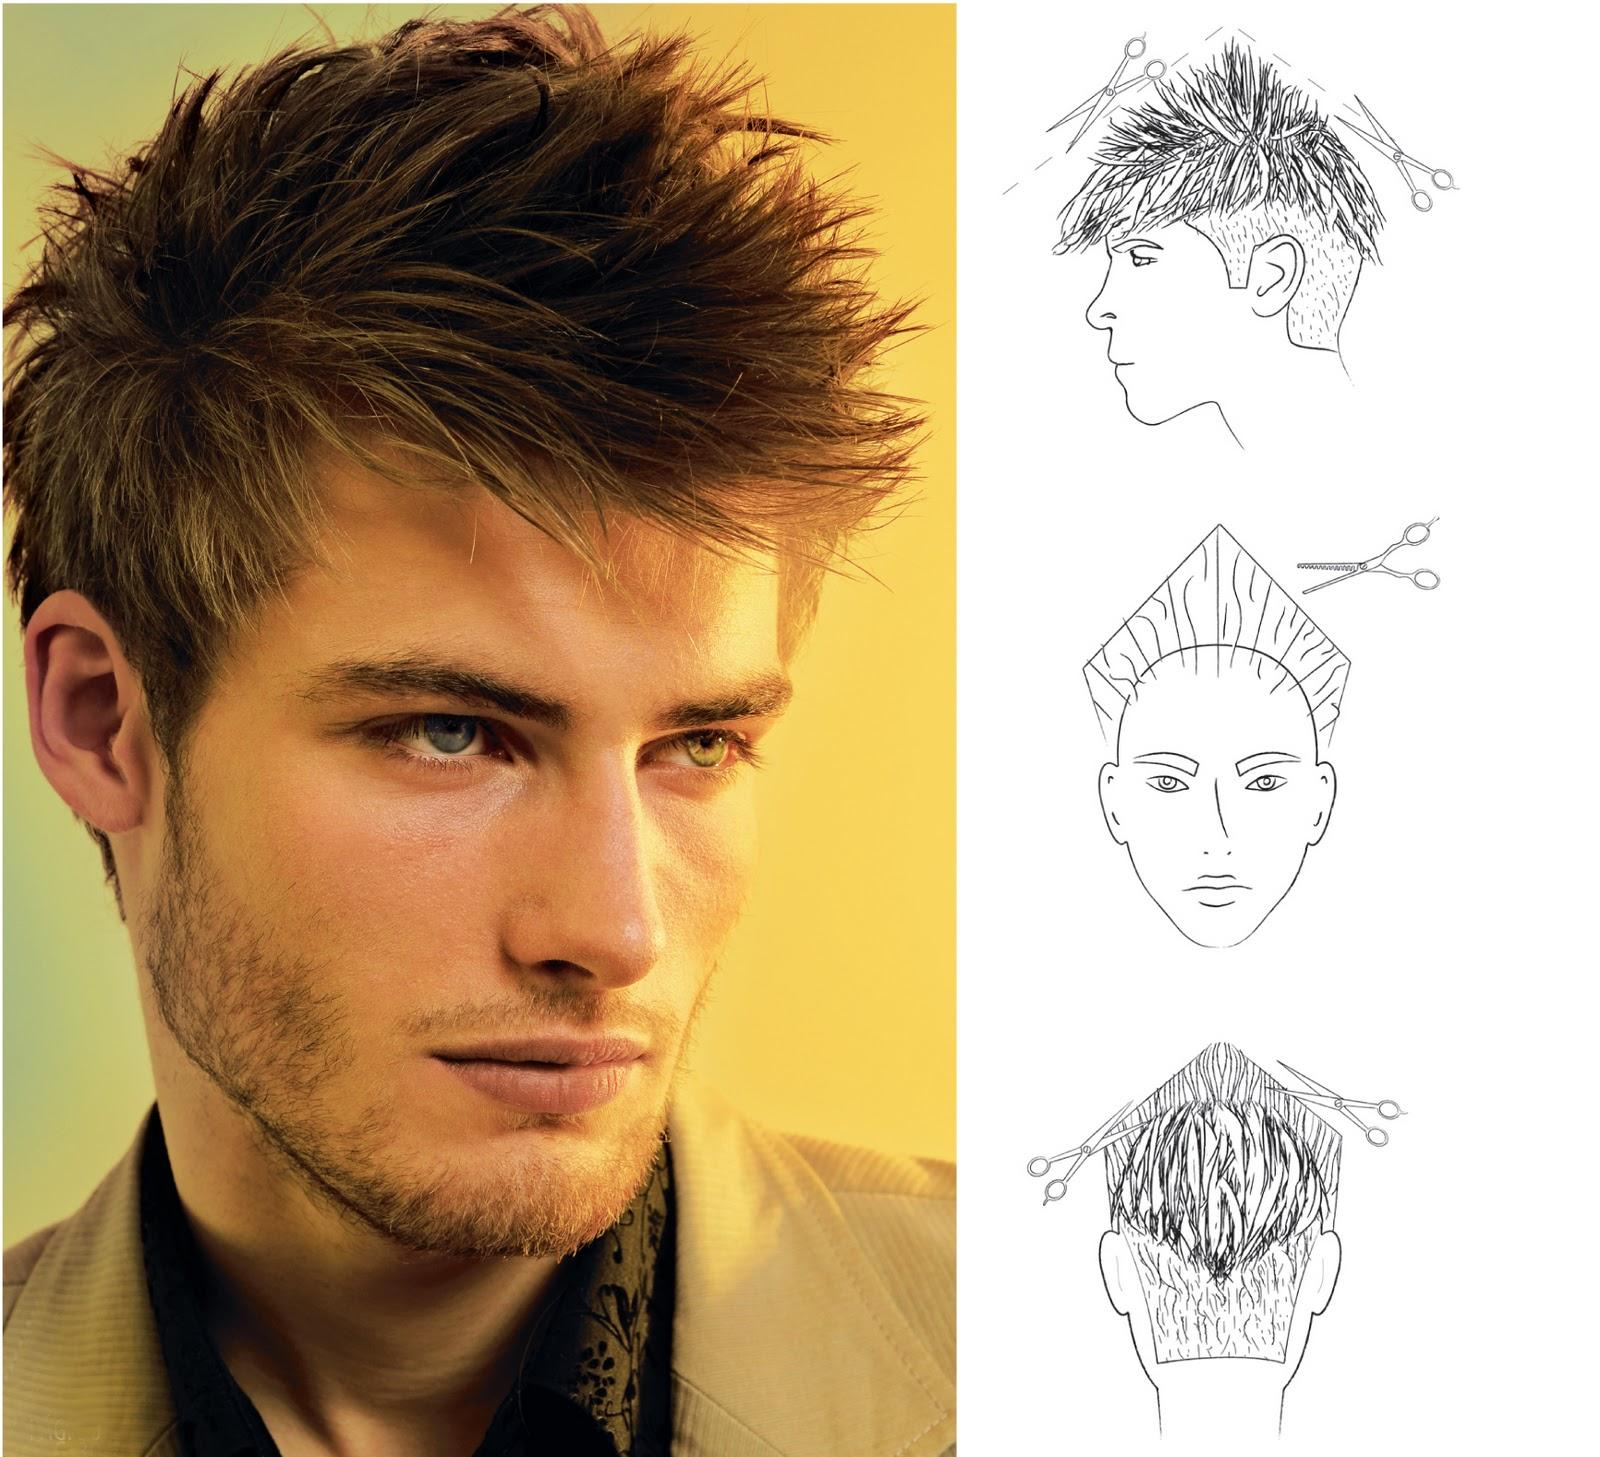 http://1.bp.blogspot.com/-9VUI6oEf5k0/TxIJKSxS56I/AAAAAAAACWs/YO2FZP8e4Ik/s1600/corte-de-cabelo-masculino-desfiado-da-moda-2011-4.jpg